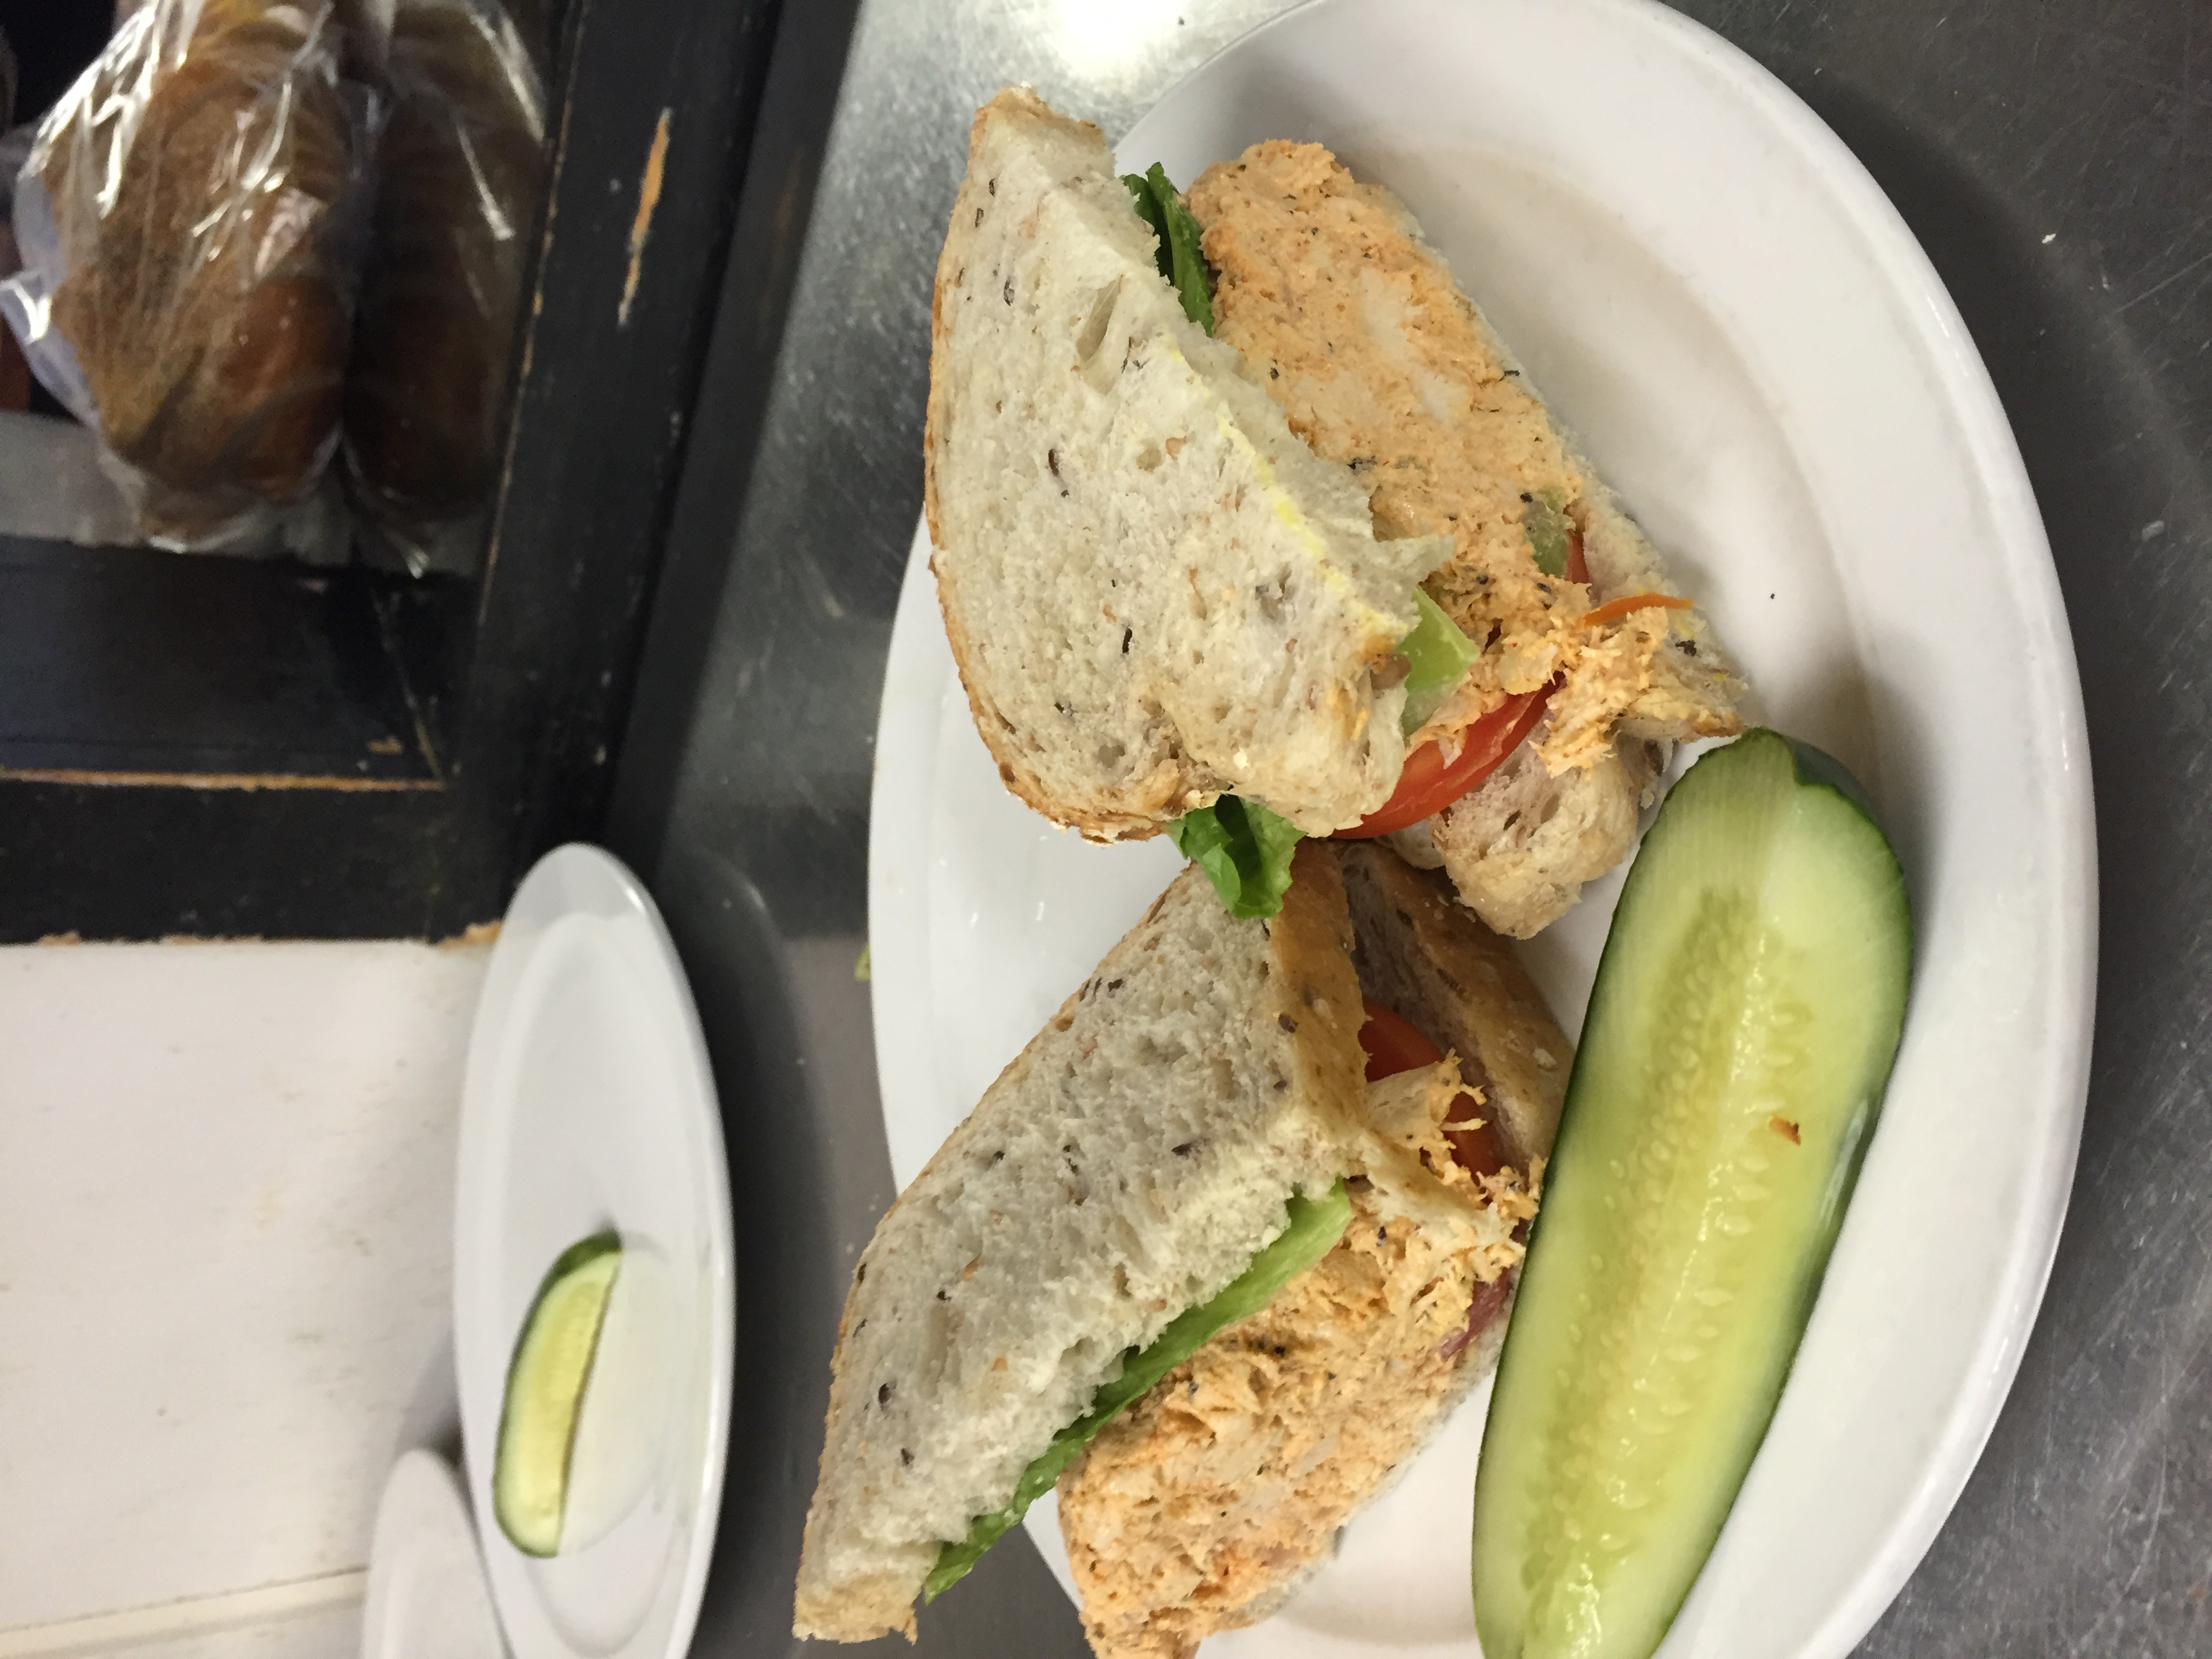 #8 Tuna, Chicken or Egg Salad Sandwich Image